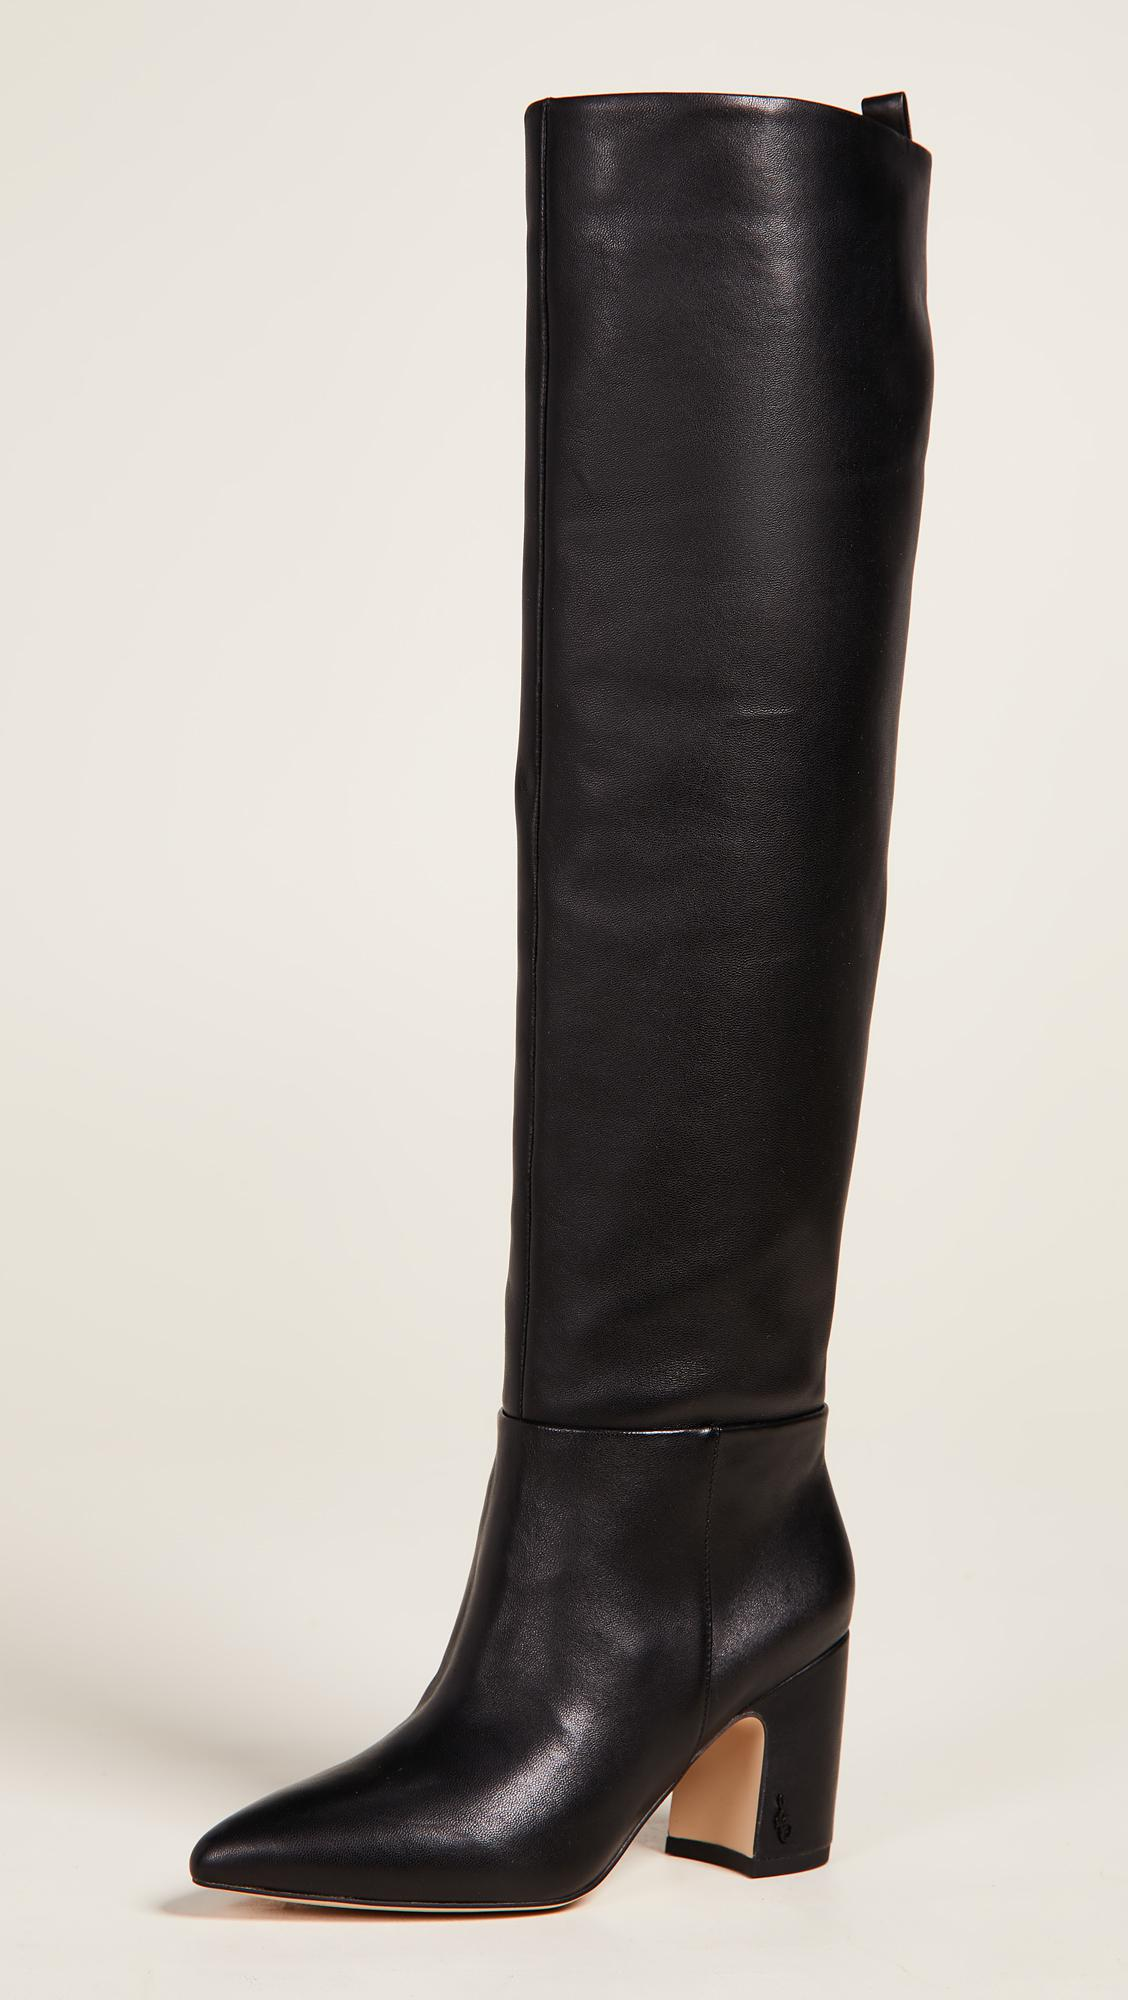 67d90bc94bfa Sam Edelman Hutton Tall Boots in Black - Lyst